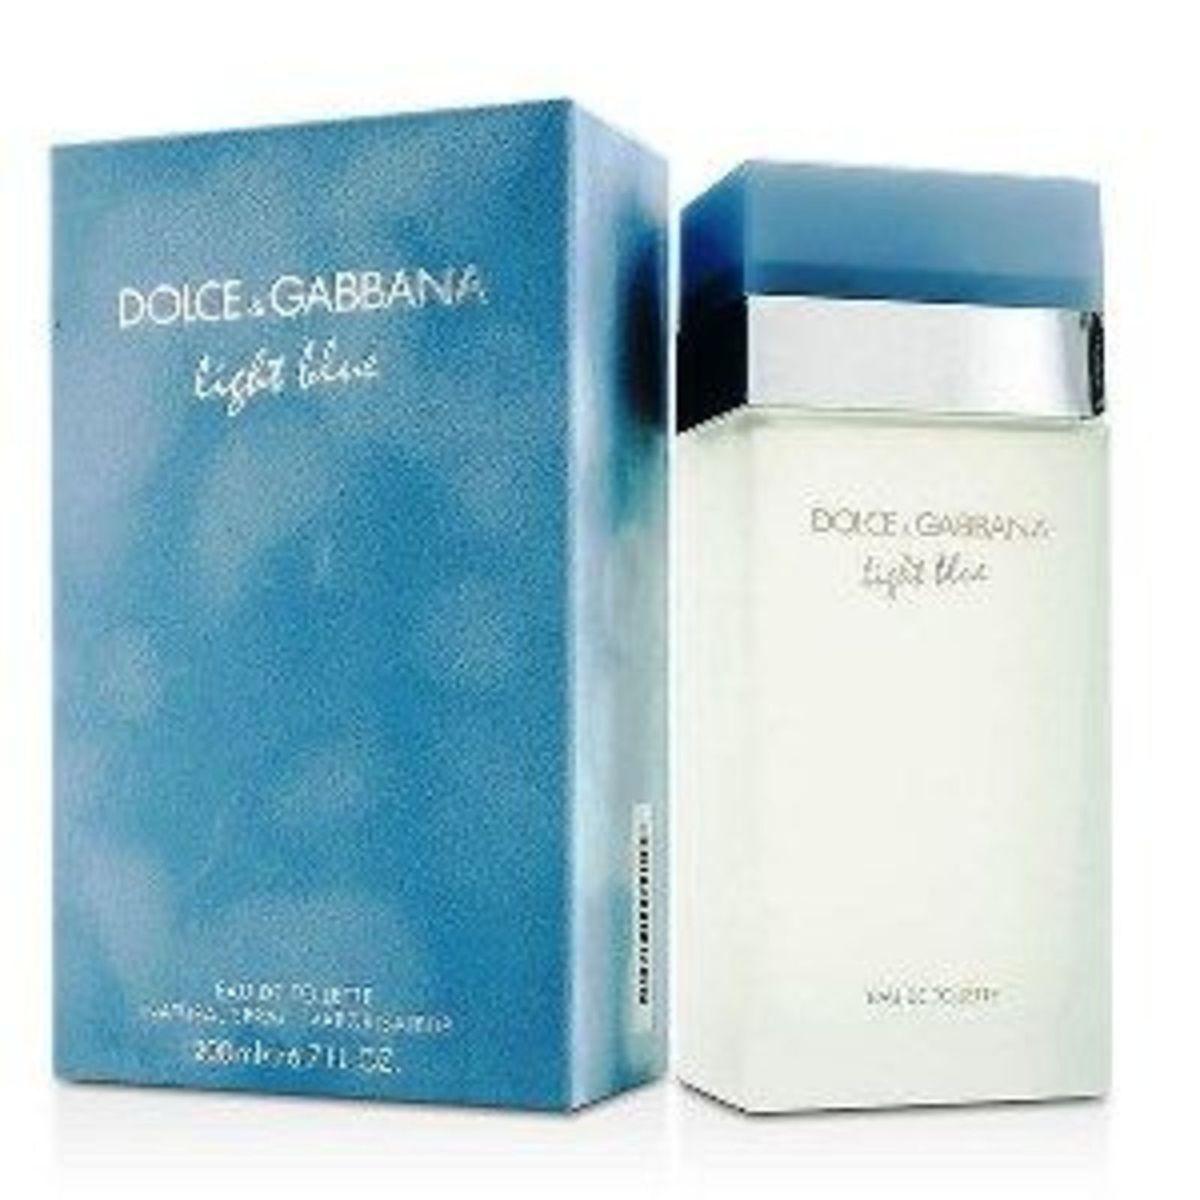 Light Blue Feminino 200ml   Perfume Feminino Dolce   Gabbana Nunca ... 0e50eb9fc1